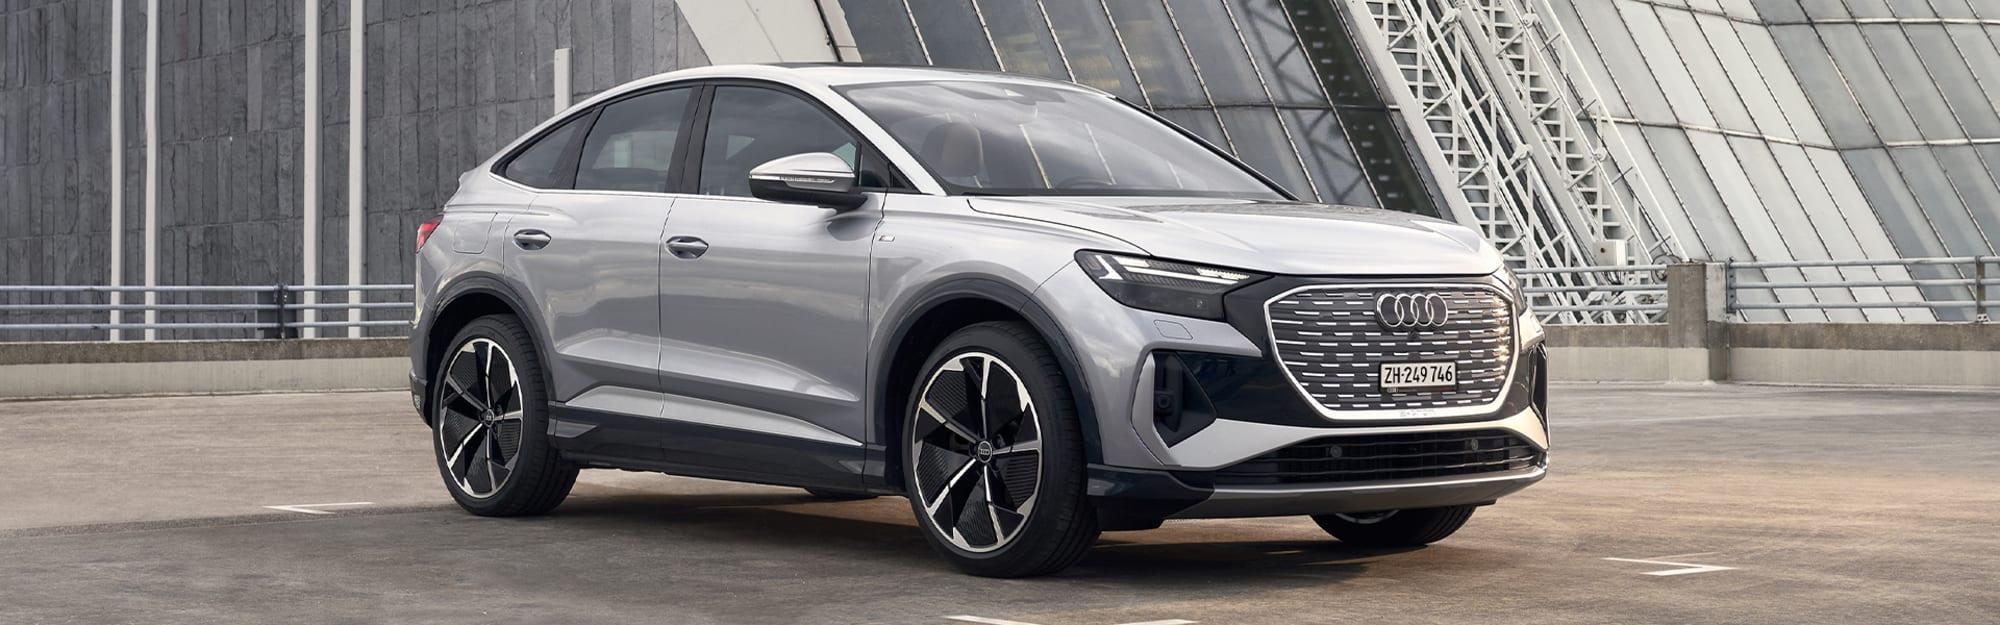 Audi_Q4SB_etron_front_Haendlerwebseite_1920x600px